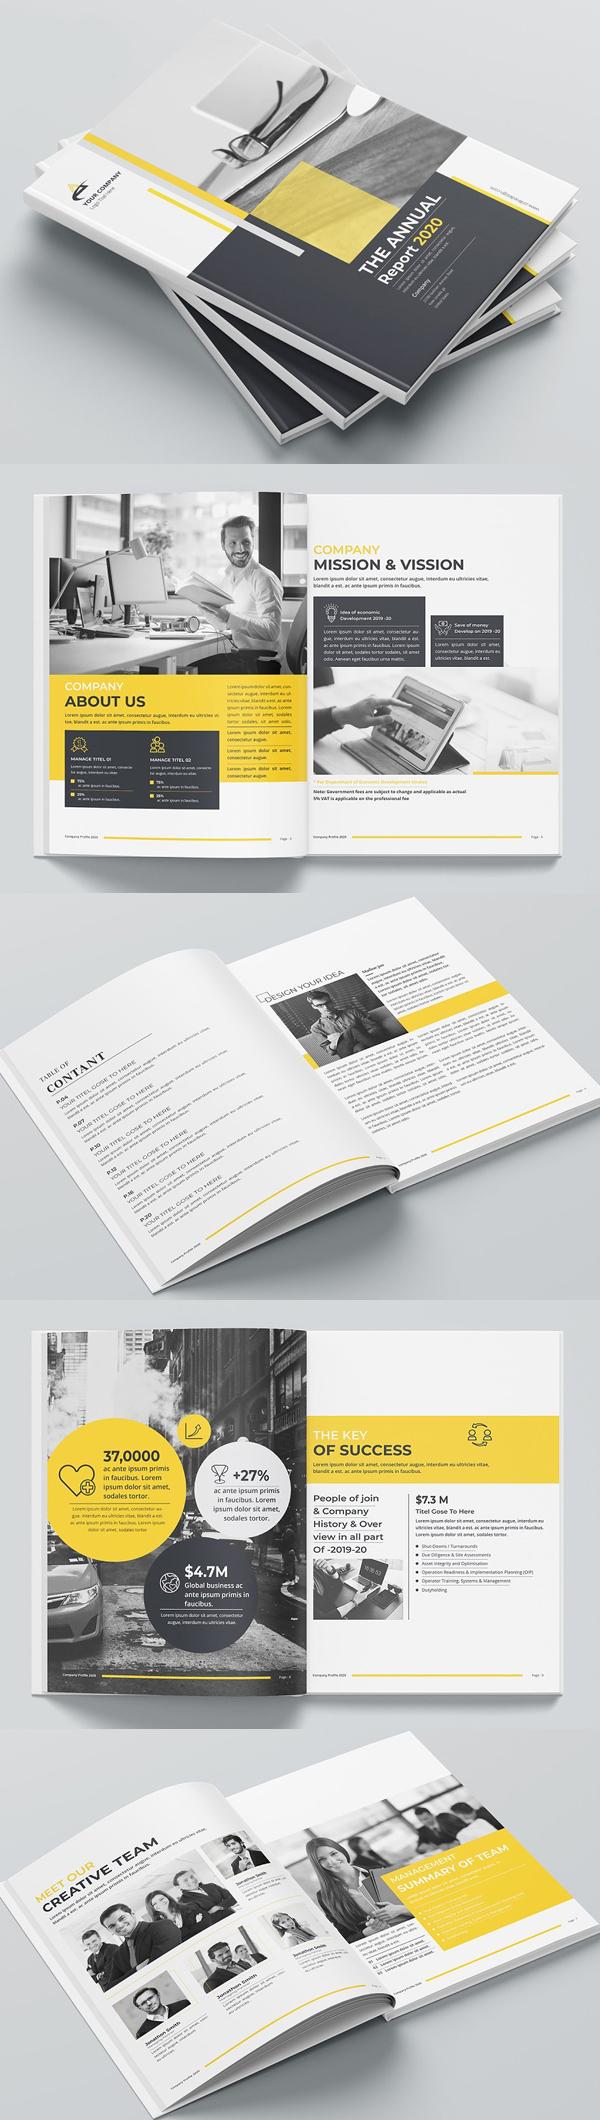 Annual Report Print Template